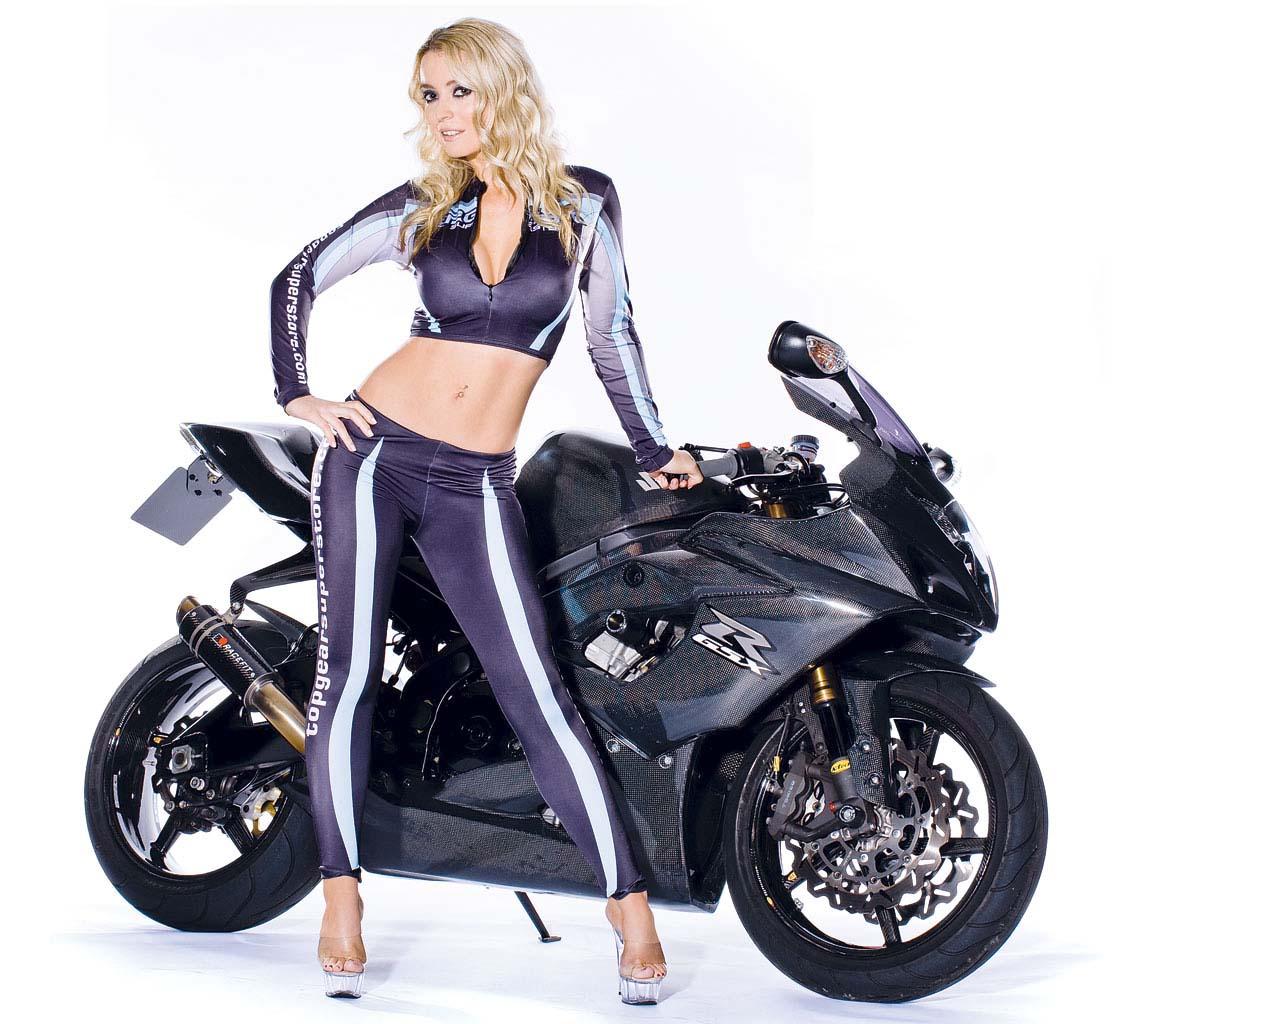 fd84e0b55 Seguridad del motociclista.